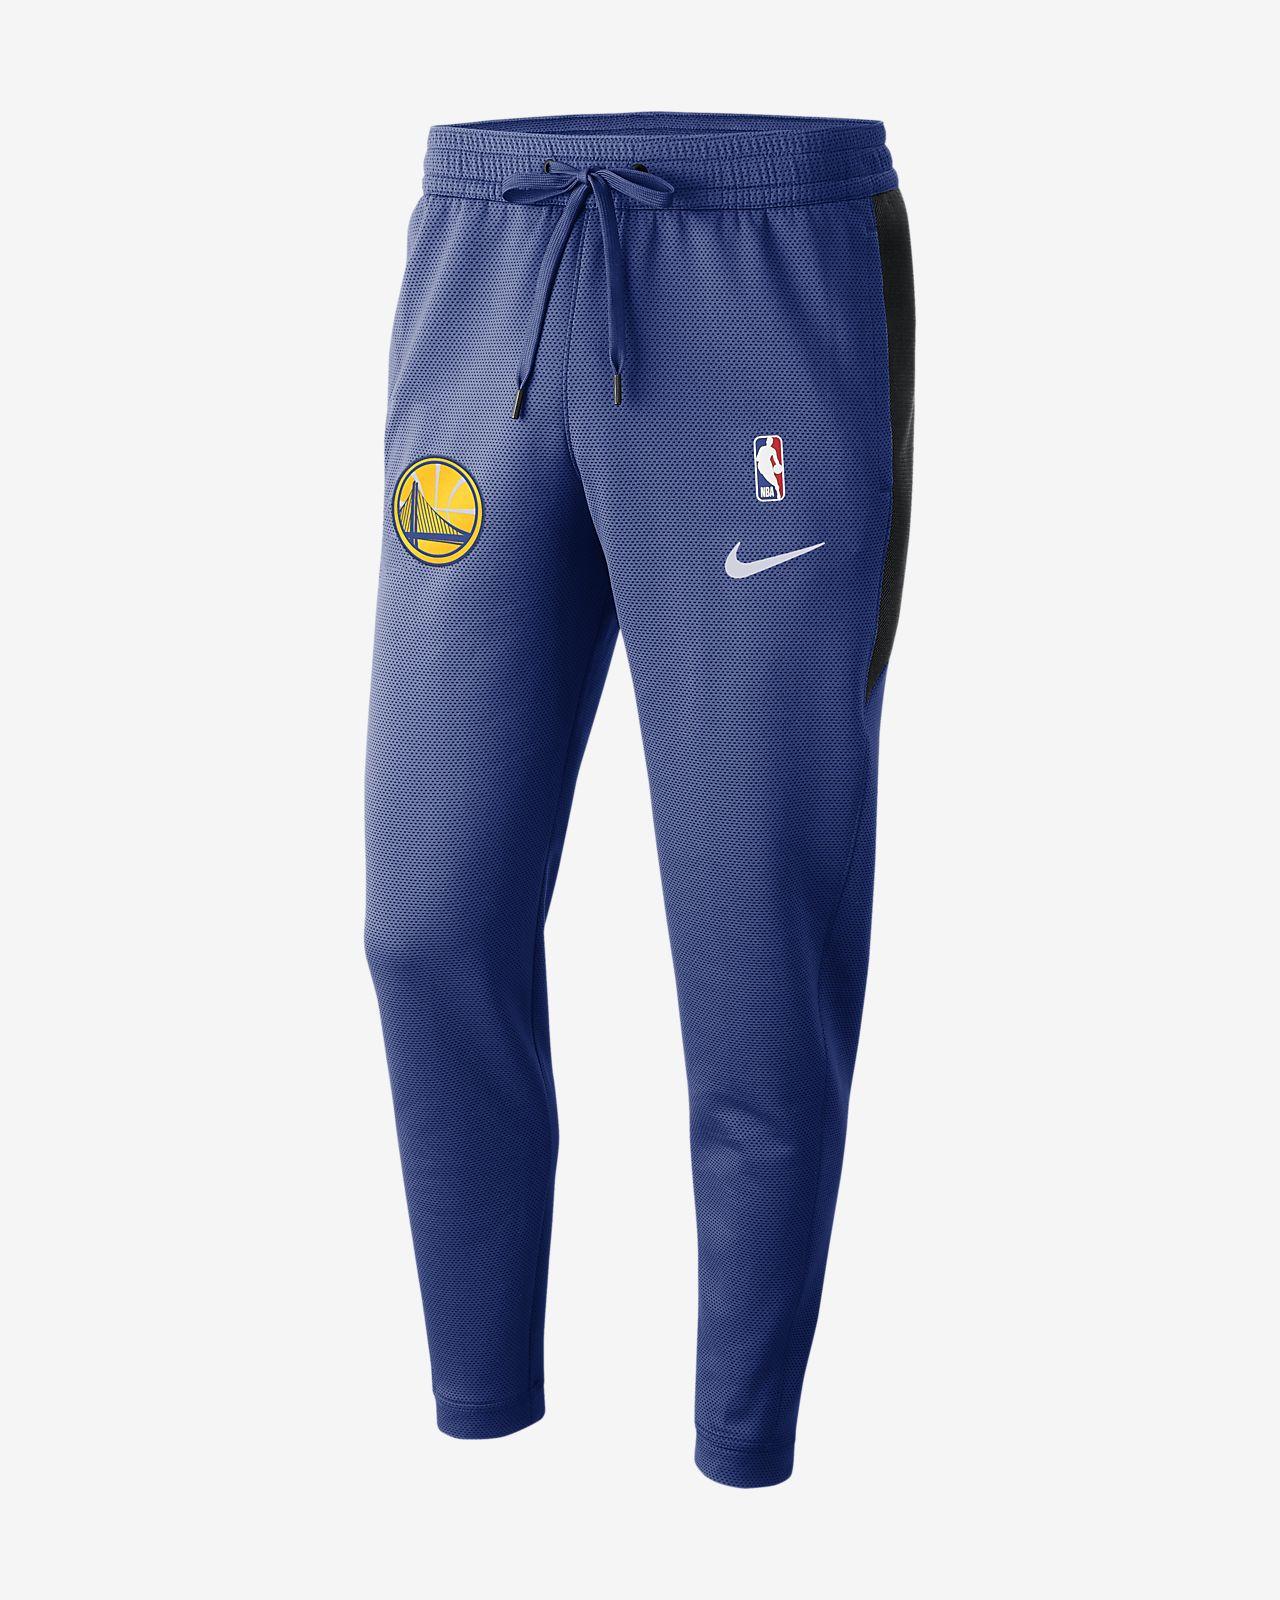 Golden State Warriors Nike Therma Flex Showtime NBA-herenbroek